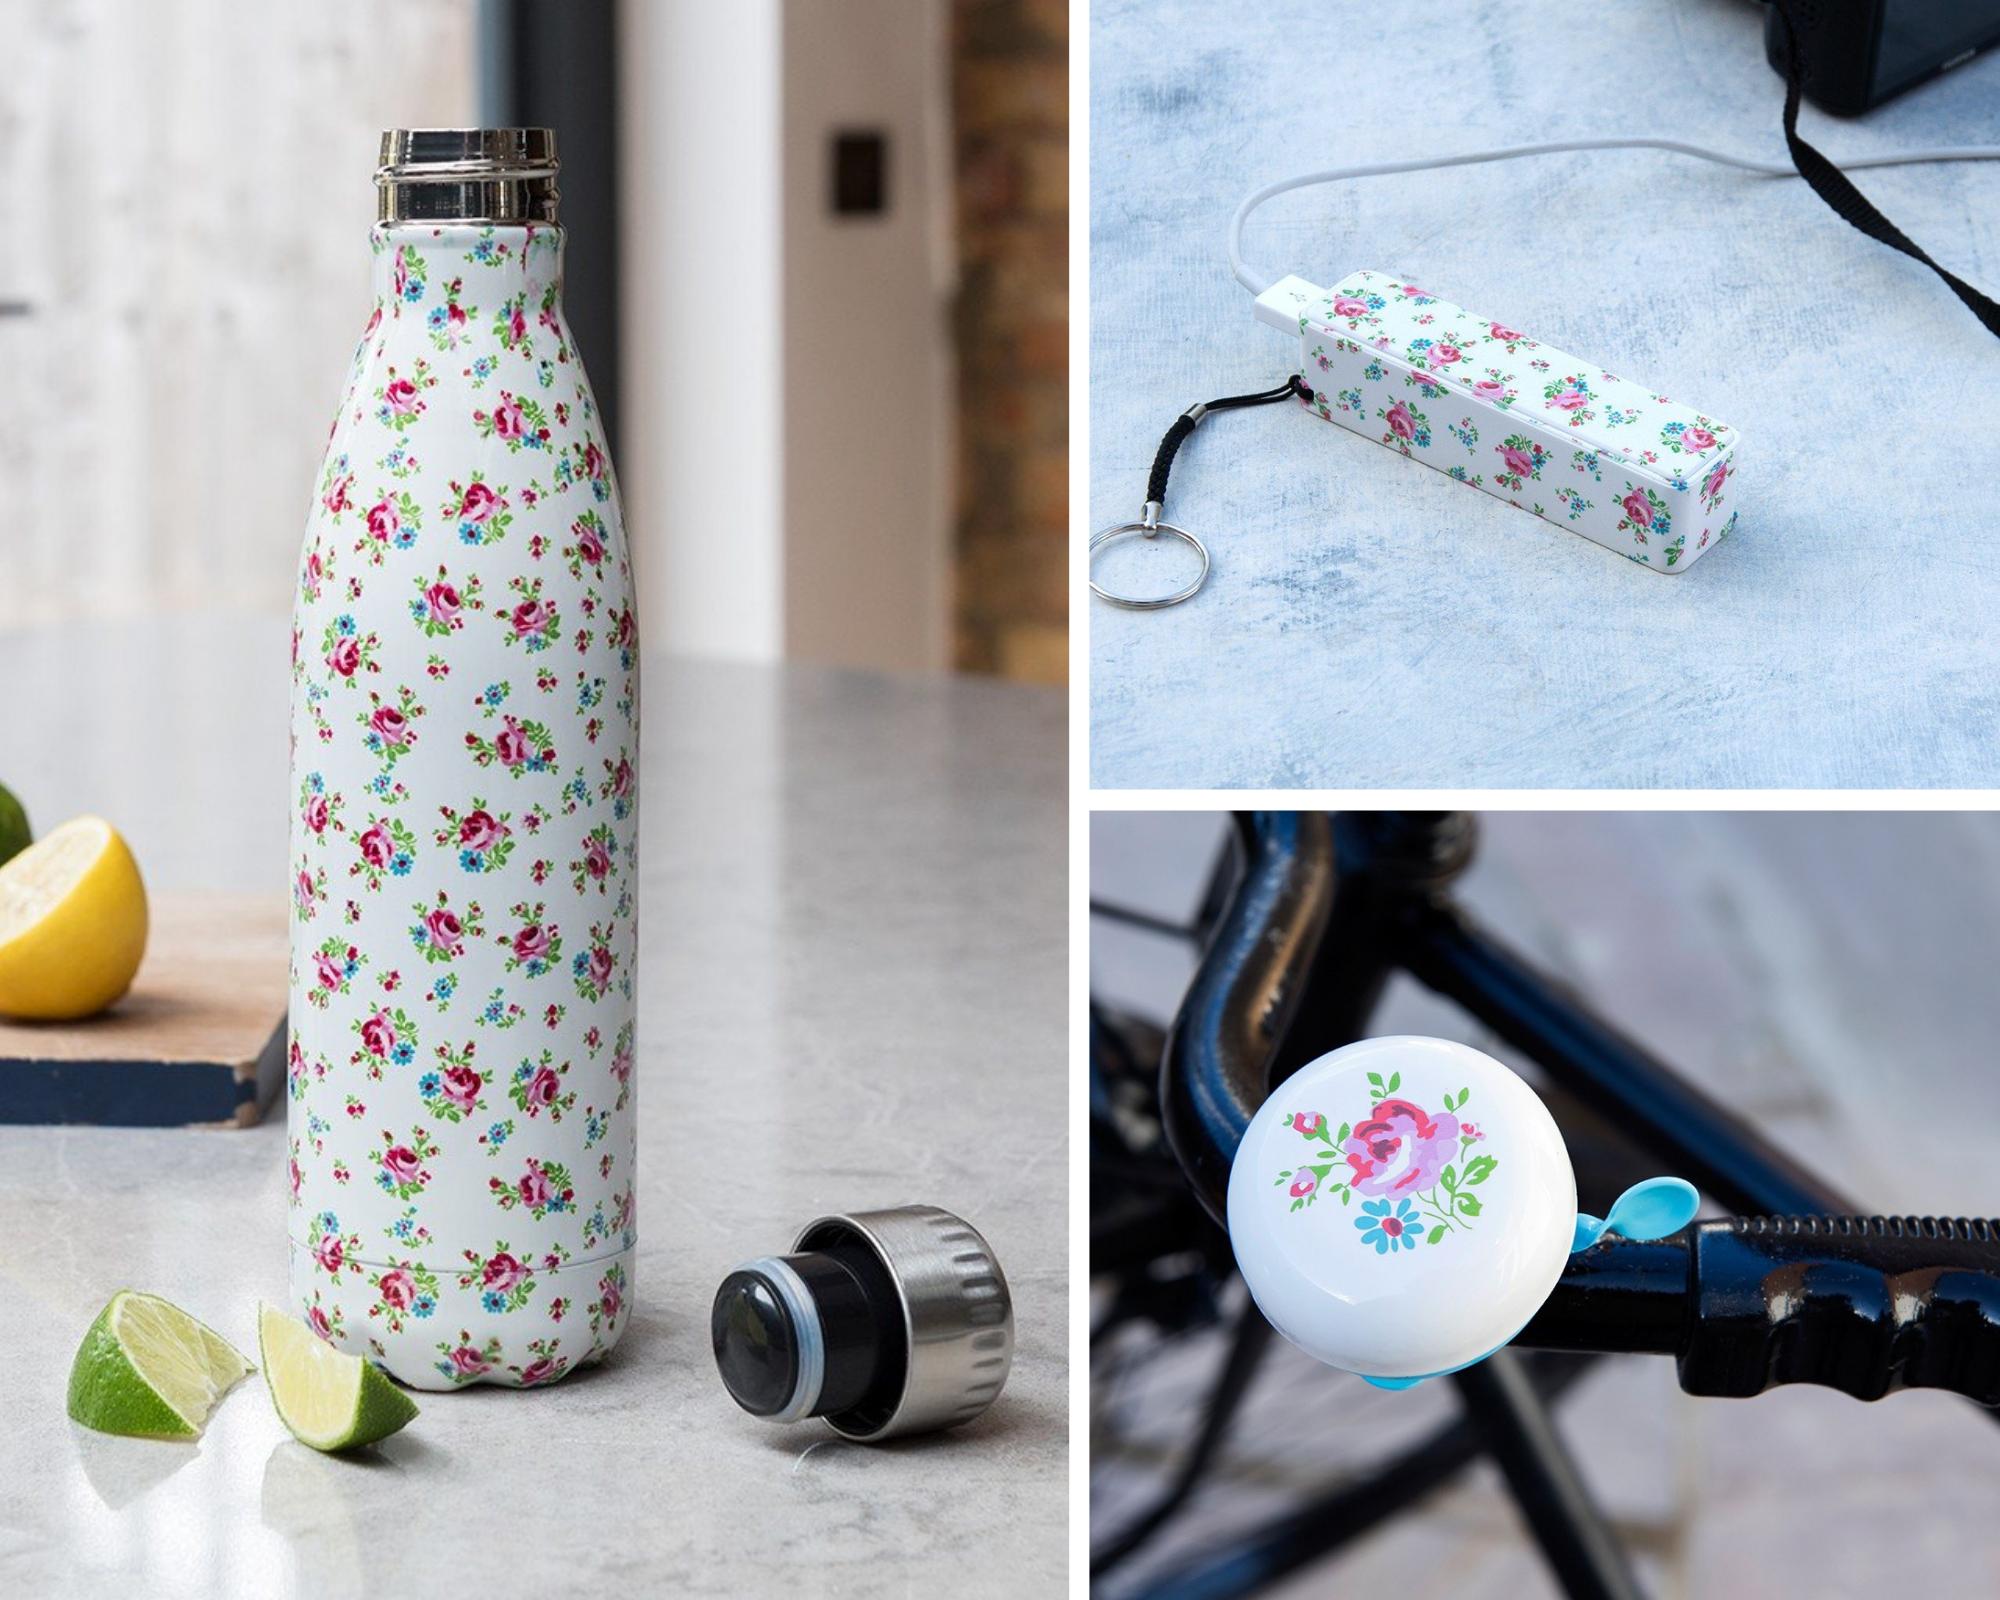 La Petite Rose water bottle, USB charger, bike bell